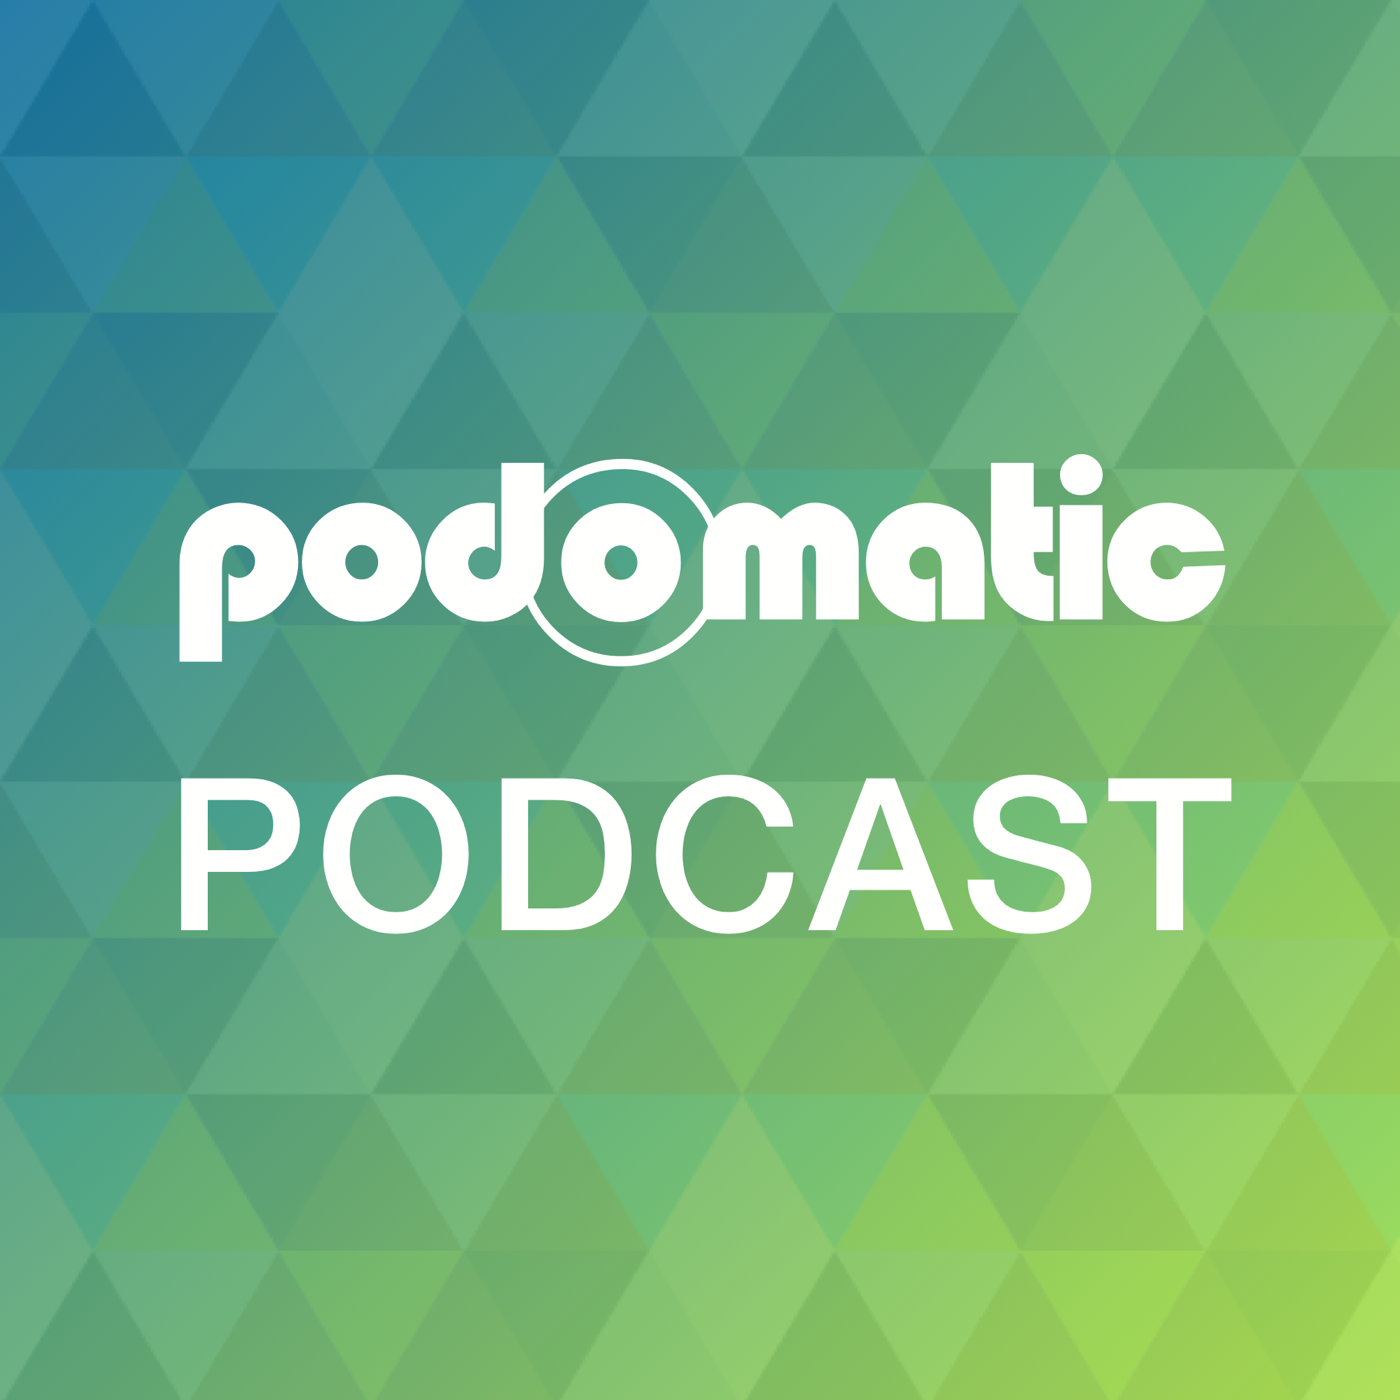 Beat Mauricio Podcast